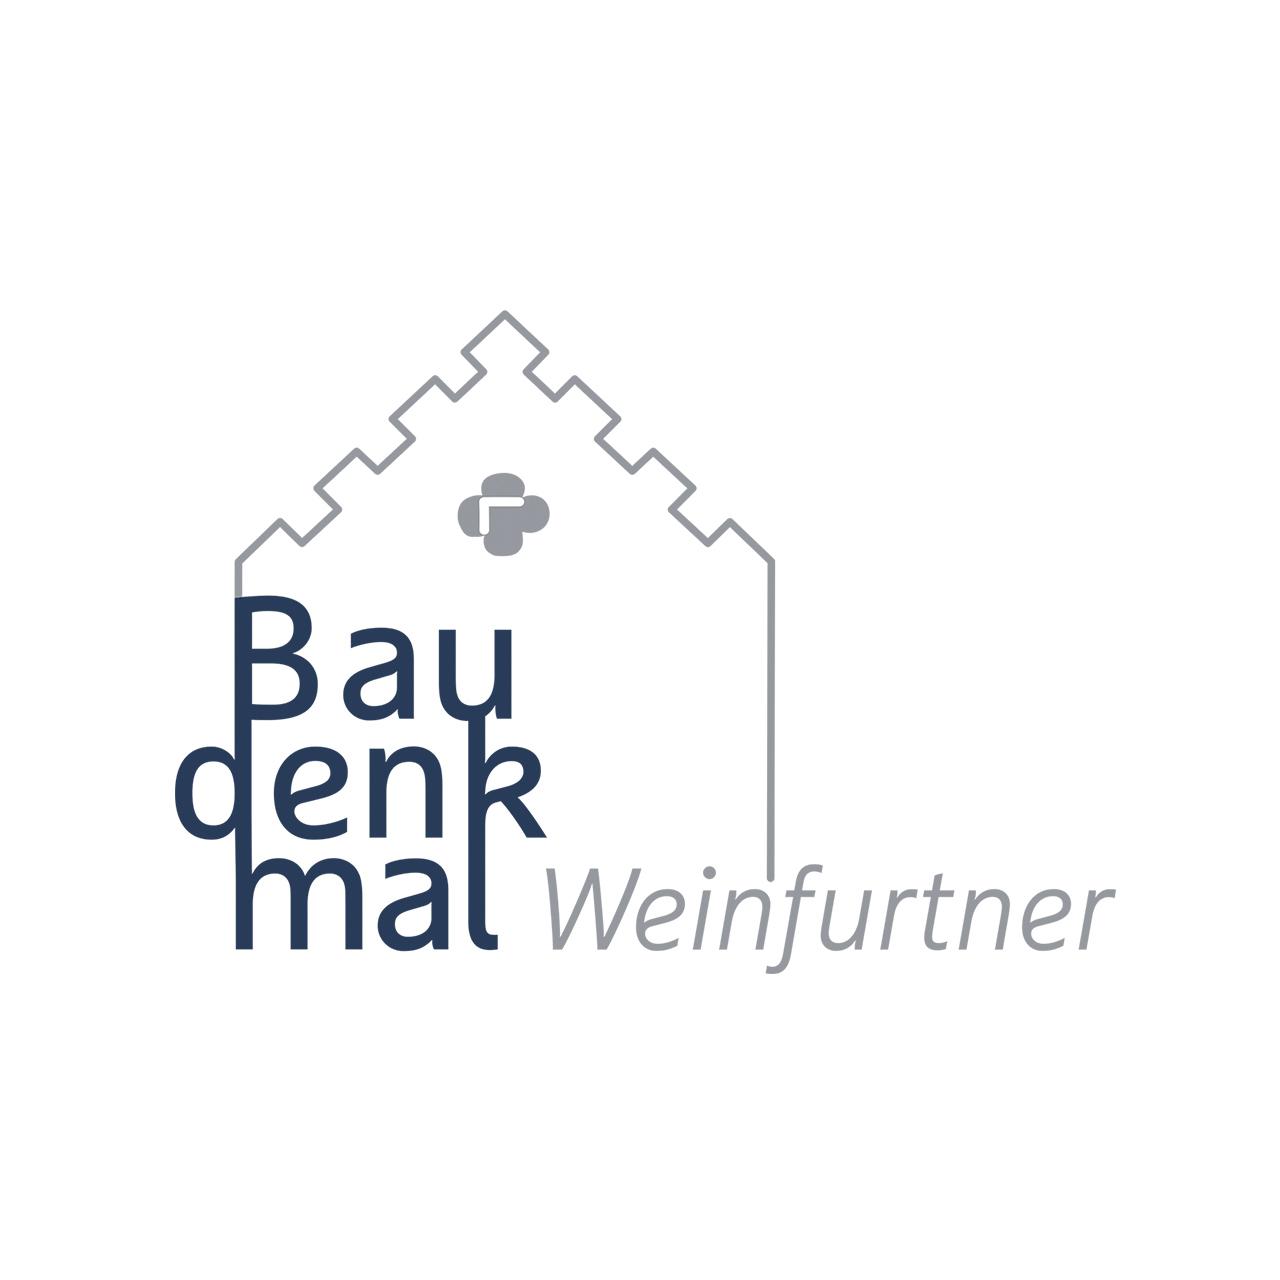 Bild zu Weinfurtner Bau Denkmal GmbH in Töging am Inn